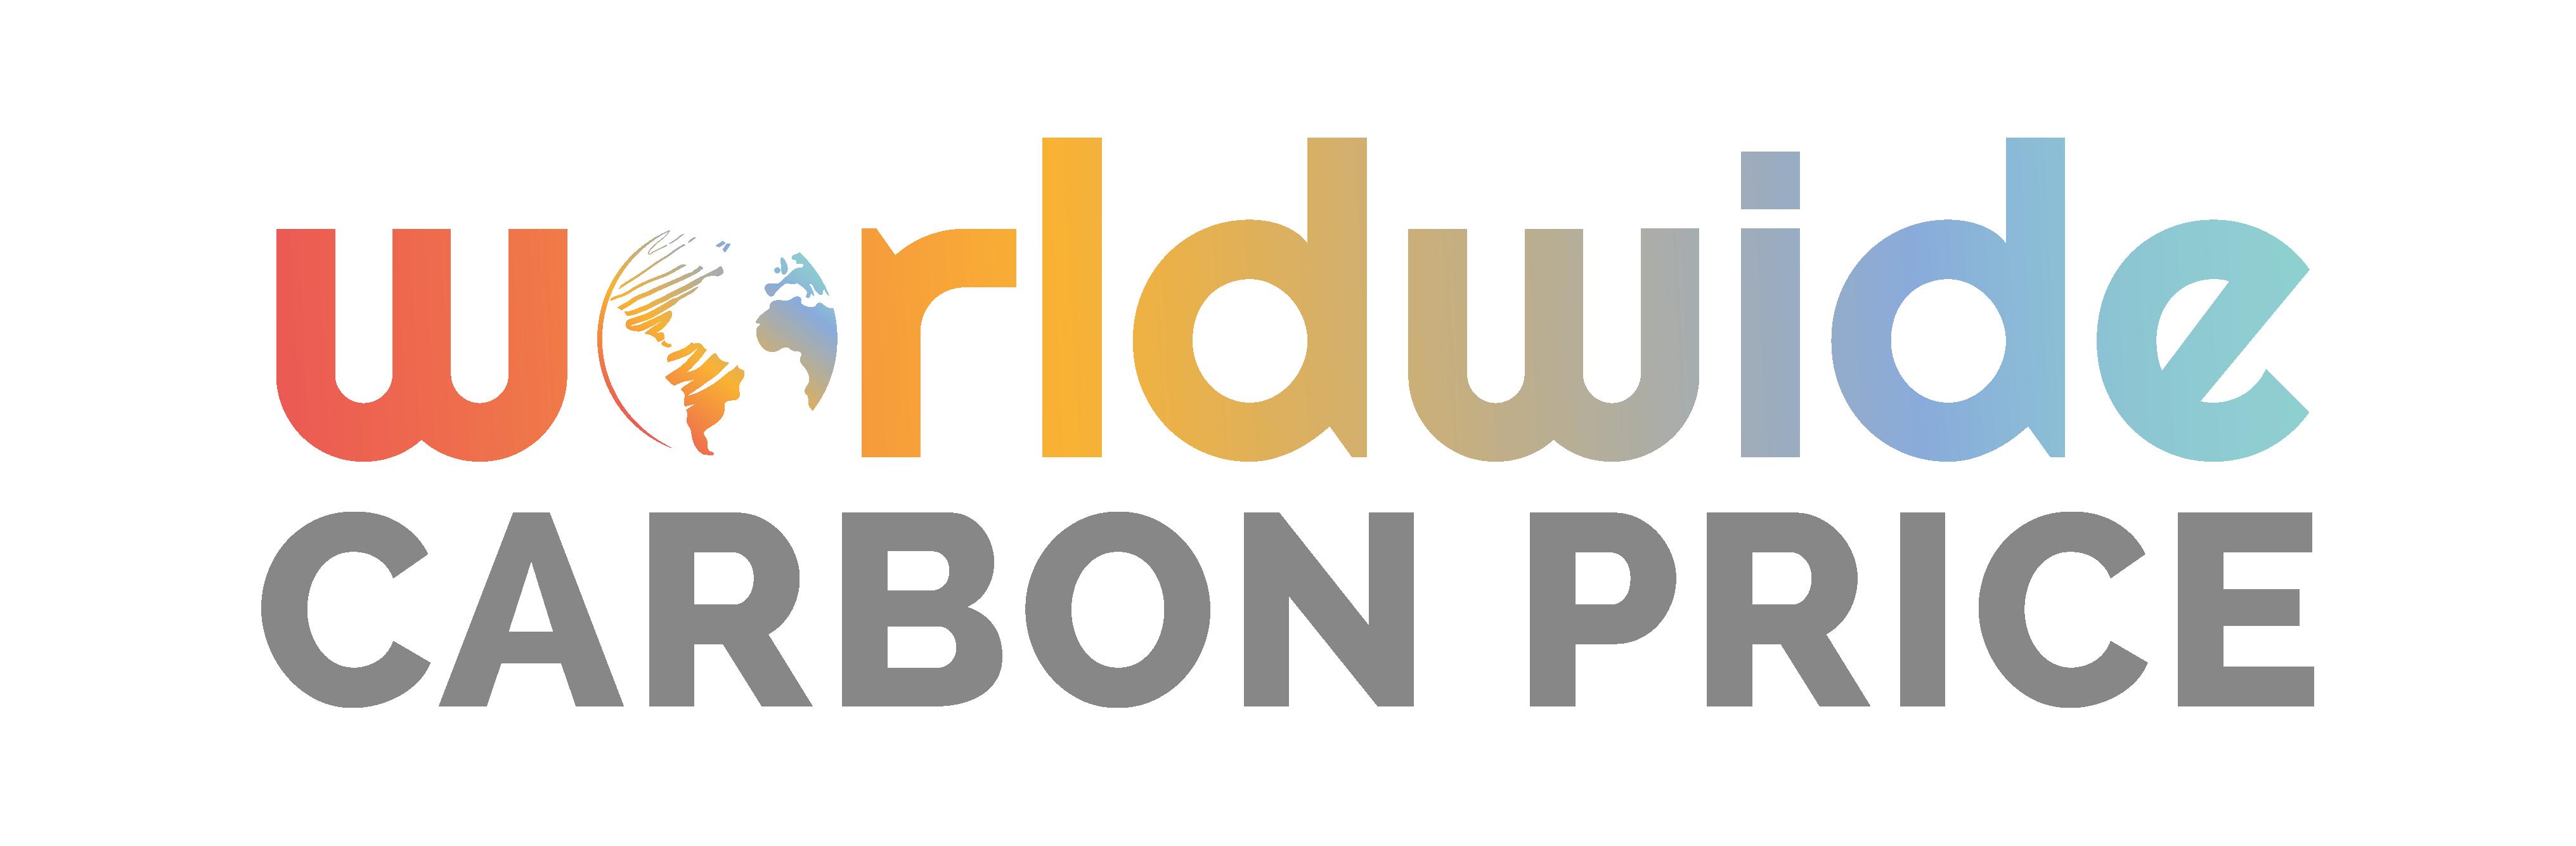 Worldwide Carbon Price